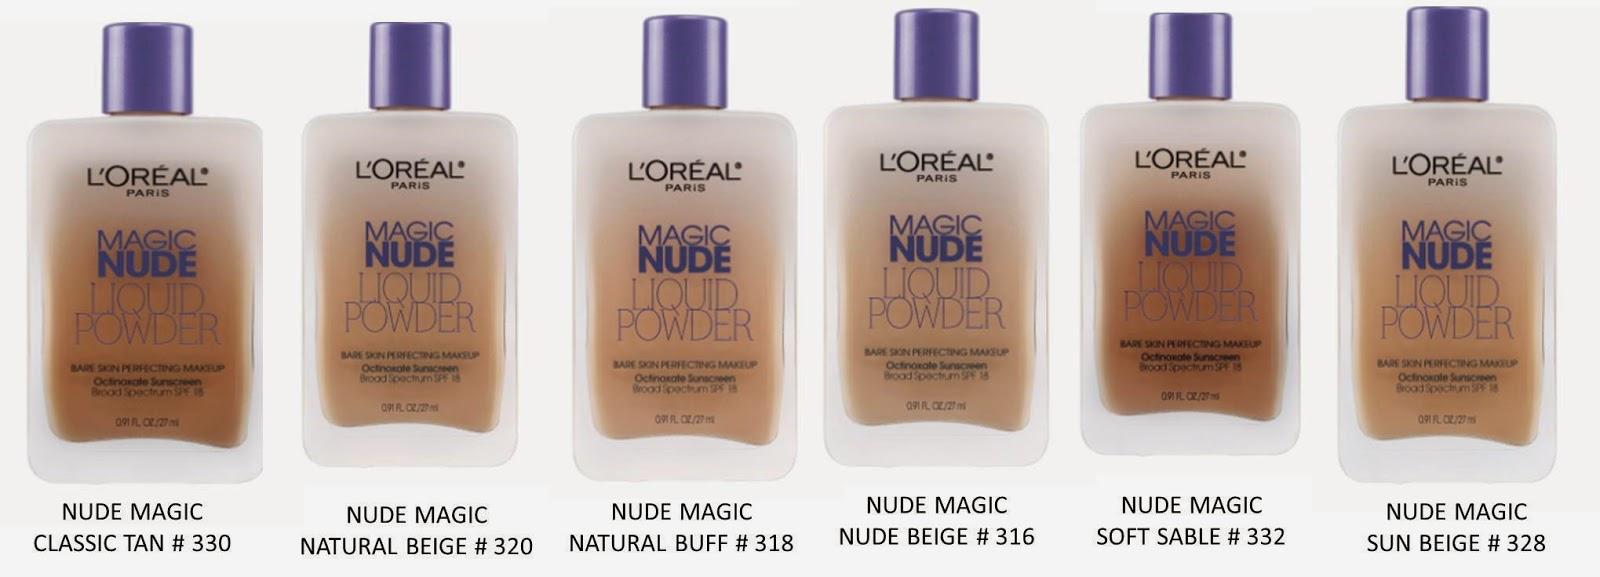 Lore nude magic nude beige fucked image